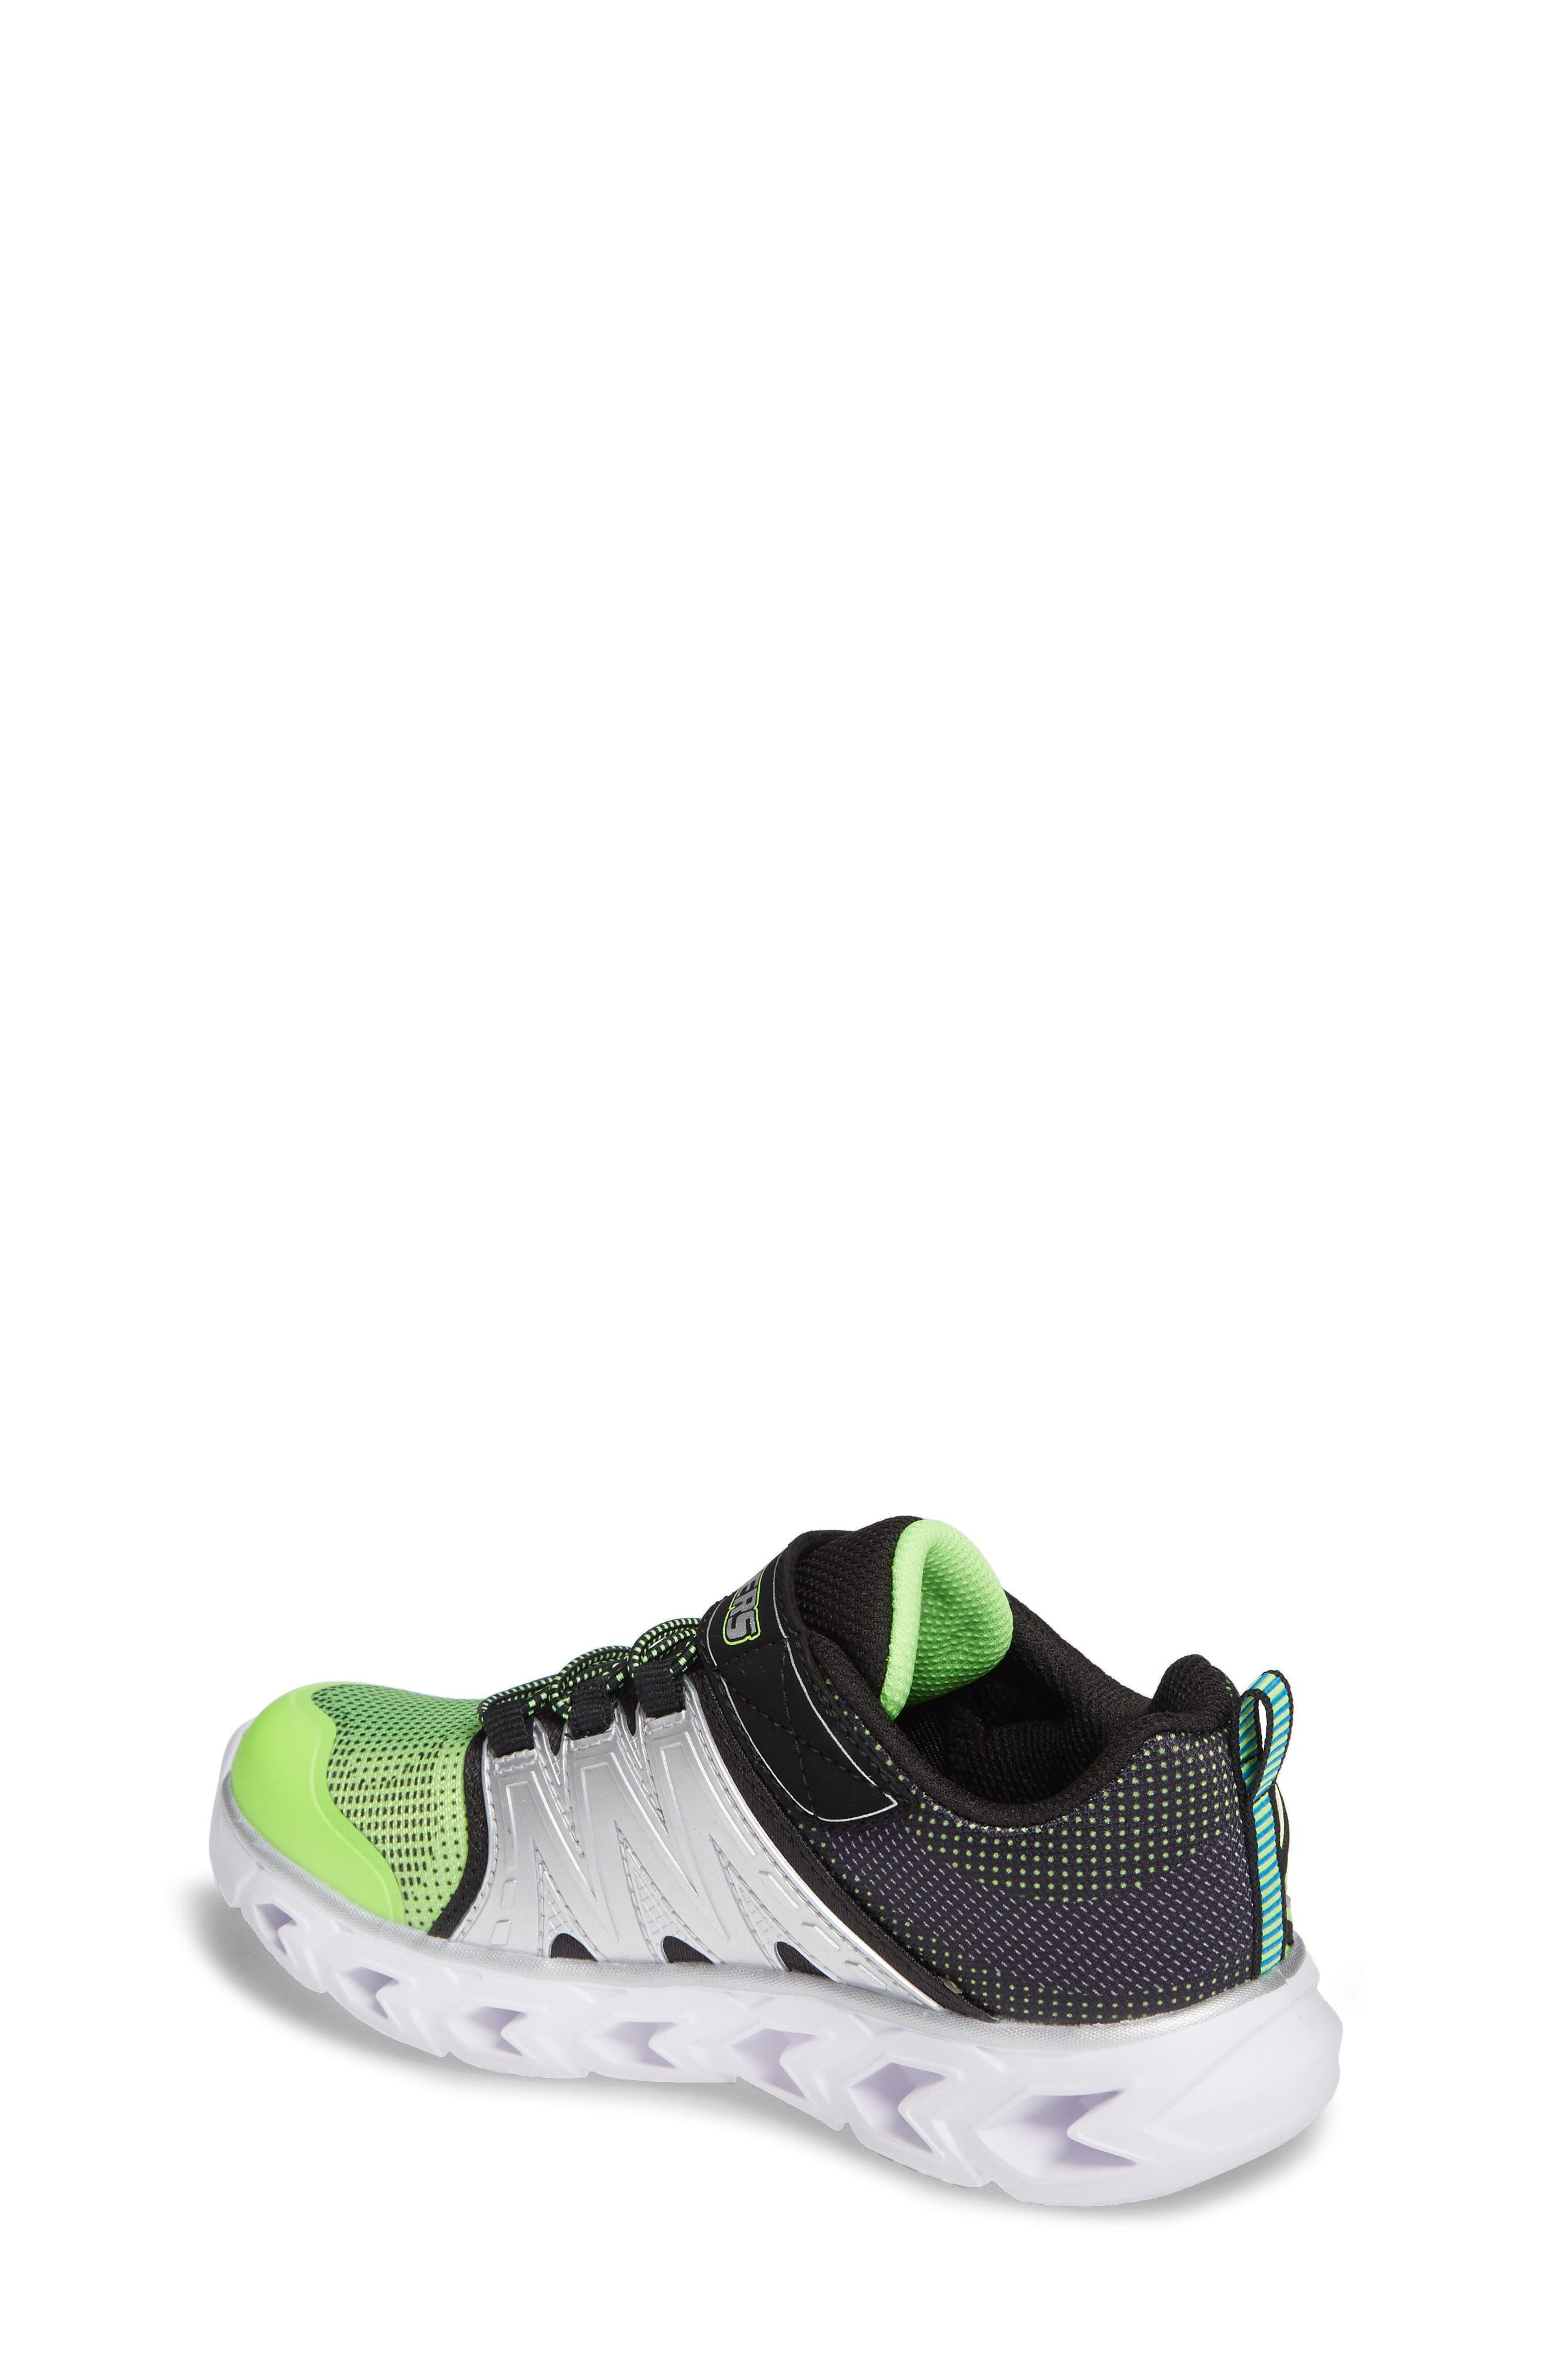 Hypno-Flash 2.0 Sneakers,                             Alternate thumbnail 6, color,                             Lime/ Black